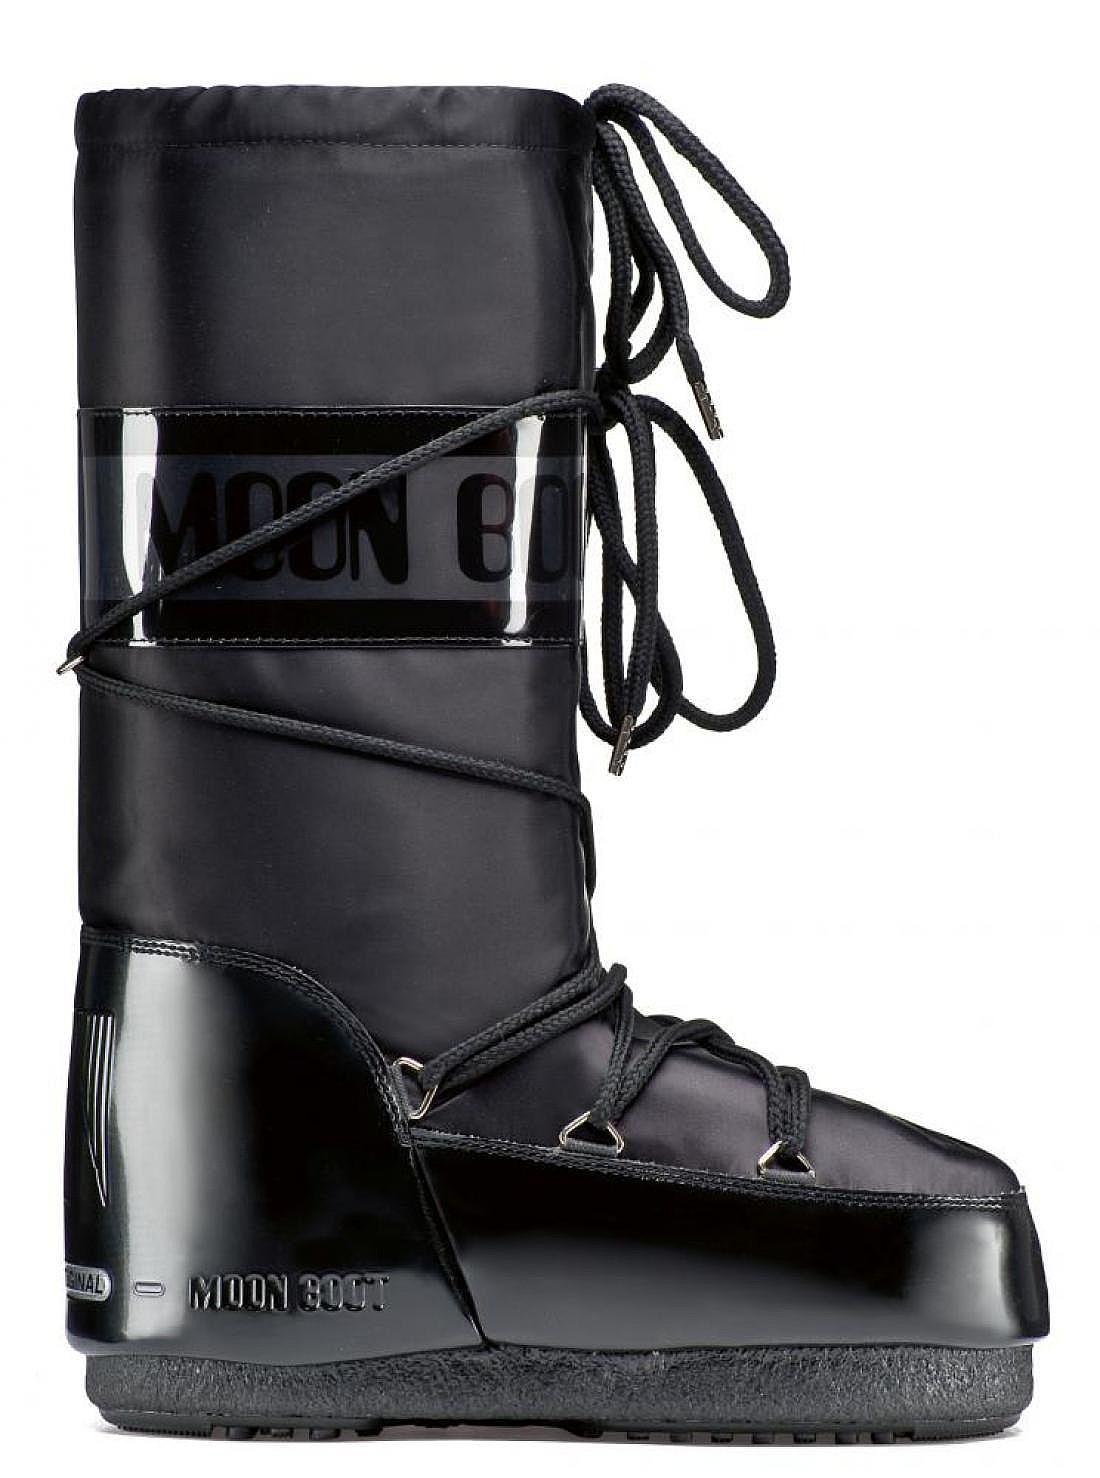 Tecnica Moon Boot Glance Shoes - Black